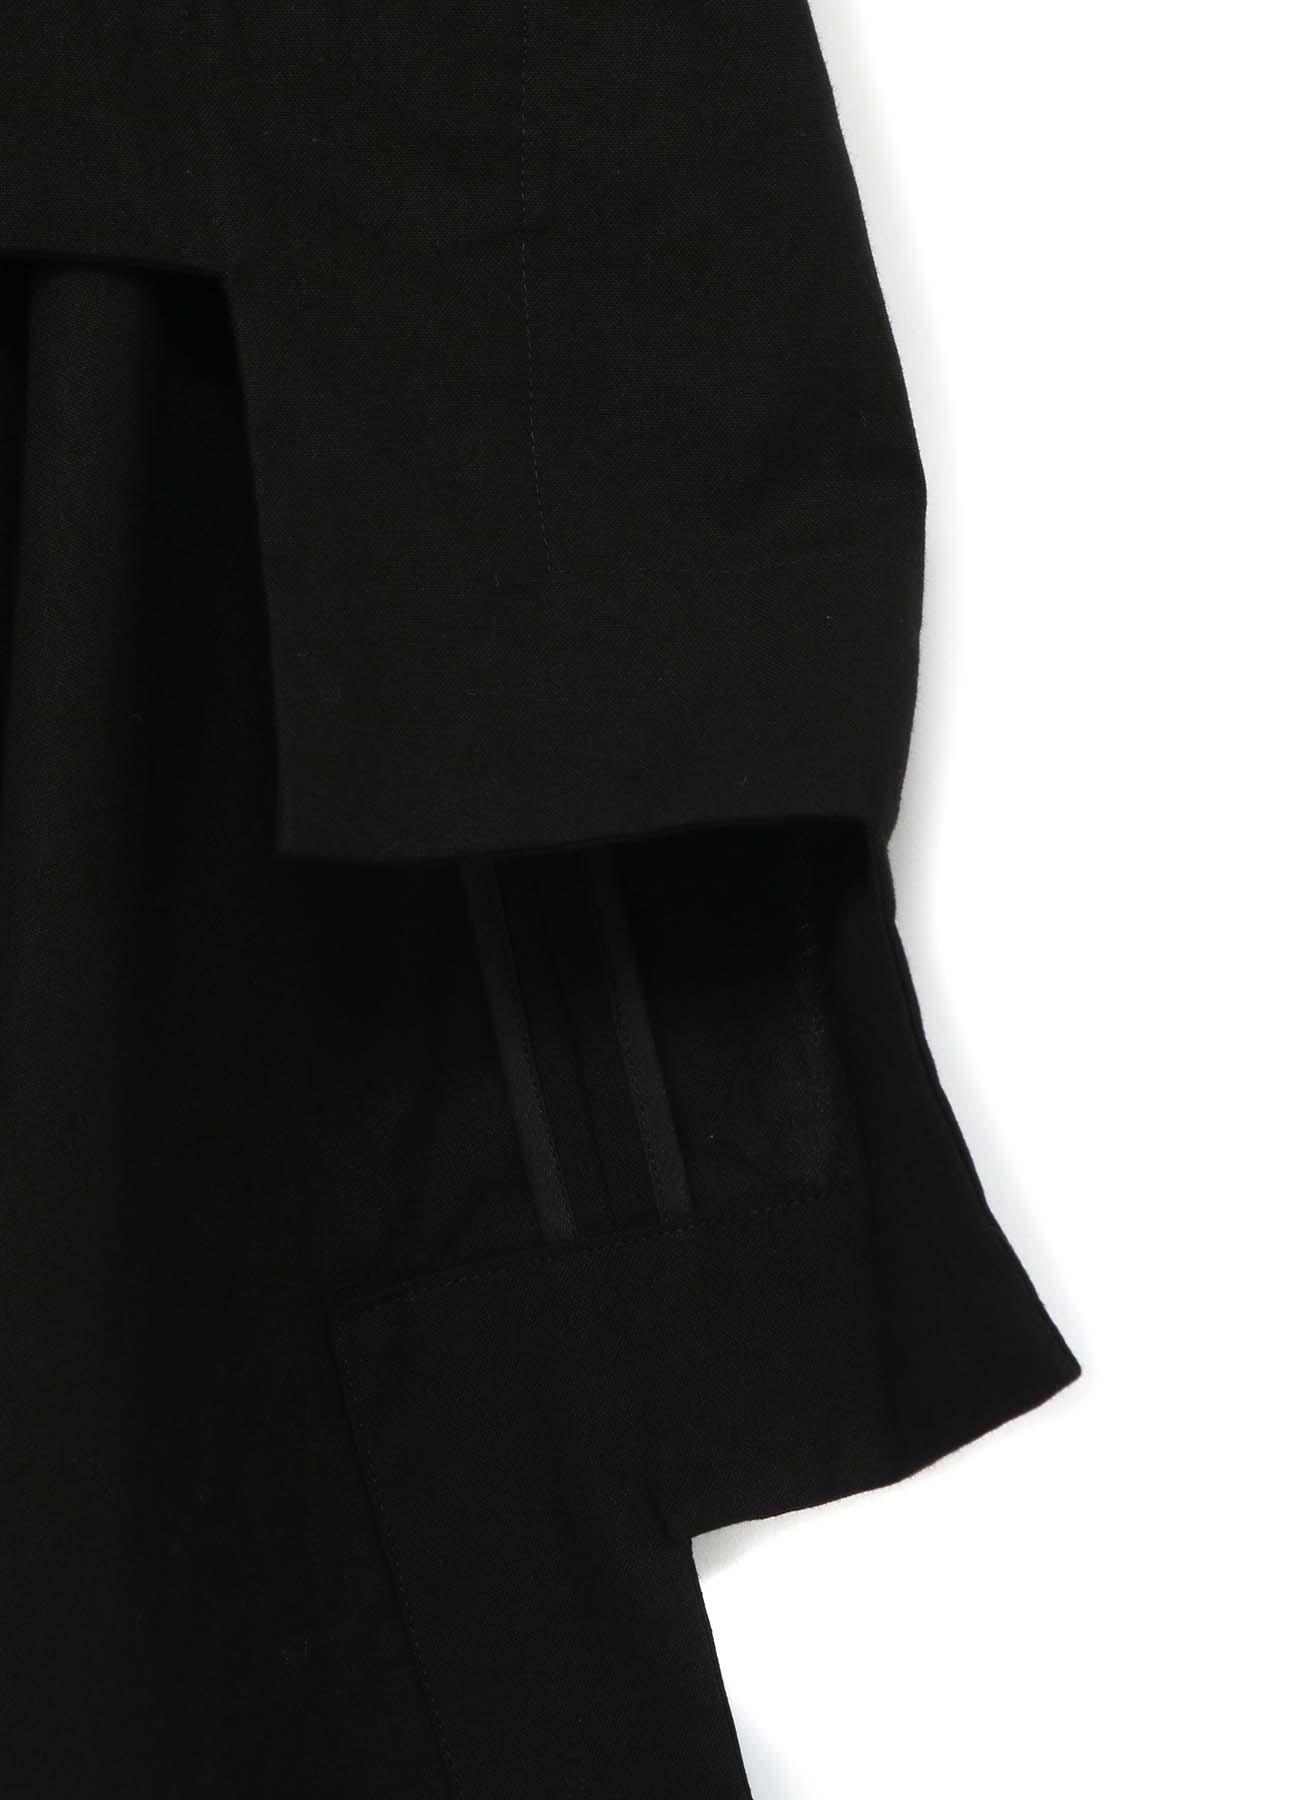 Cotton Cloth Block Design Dress B